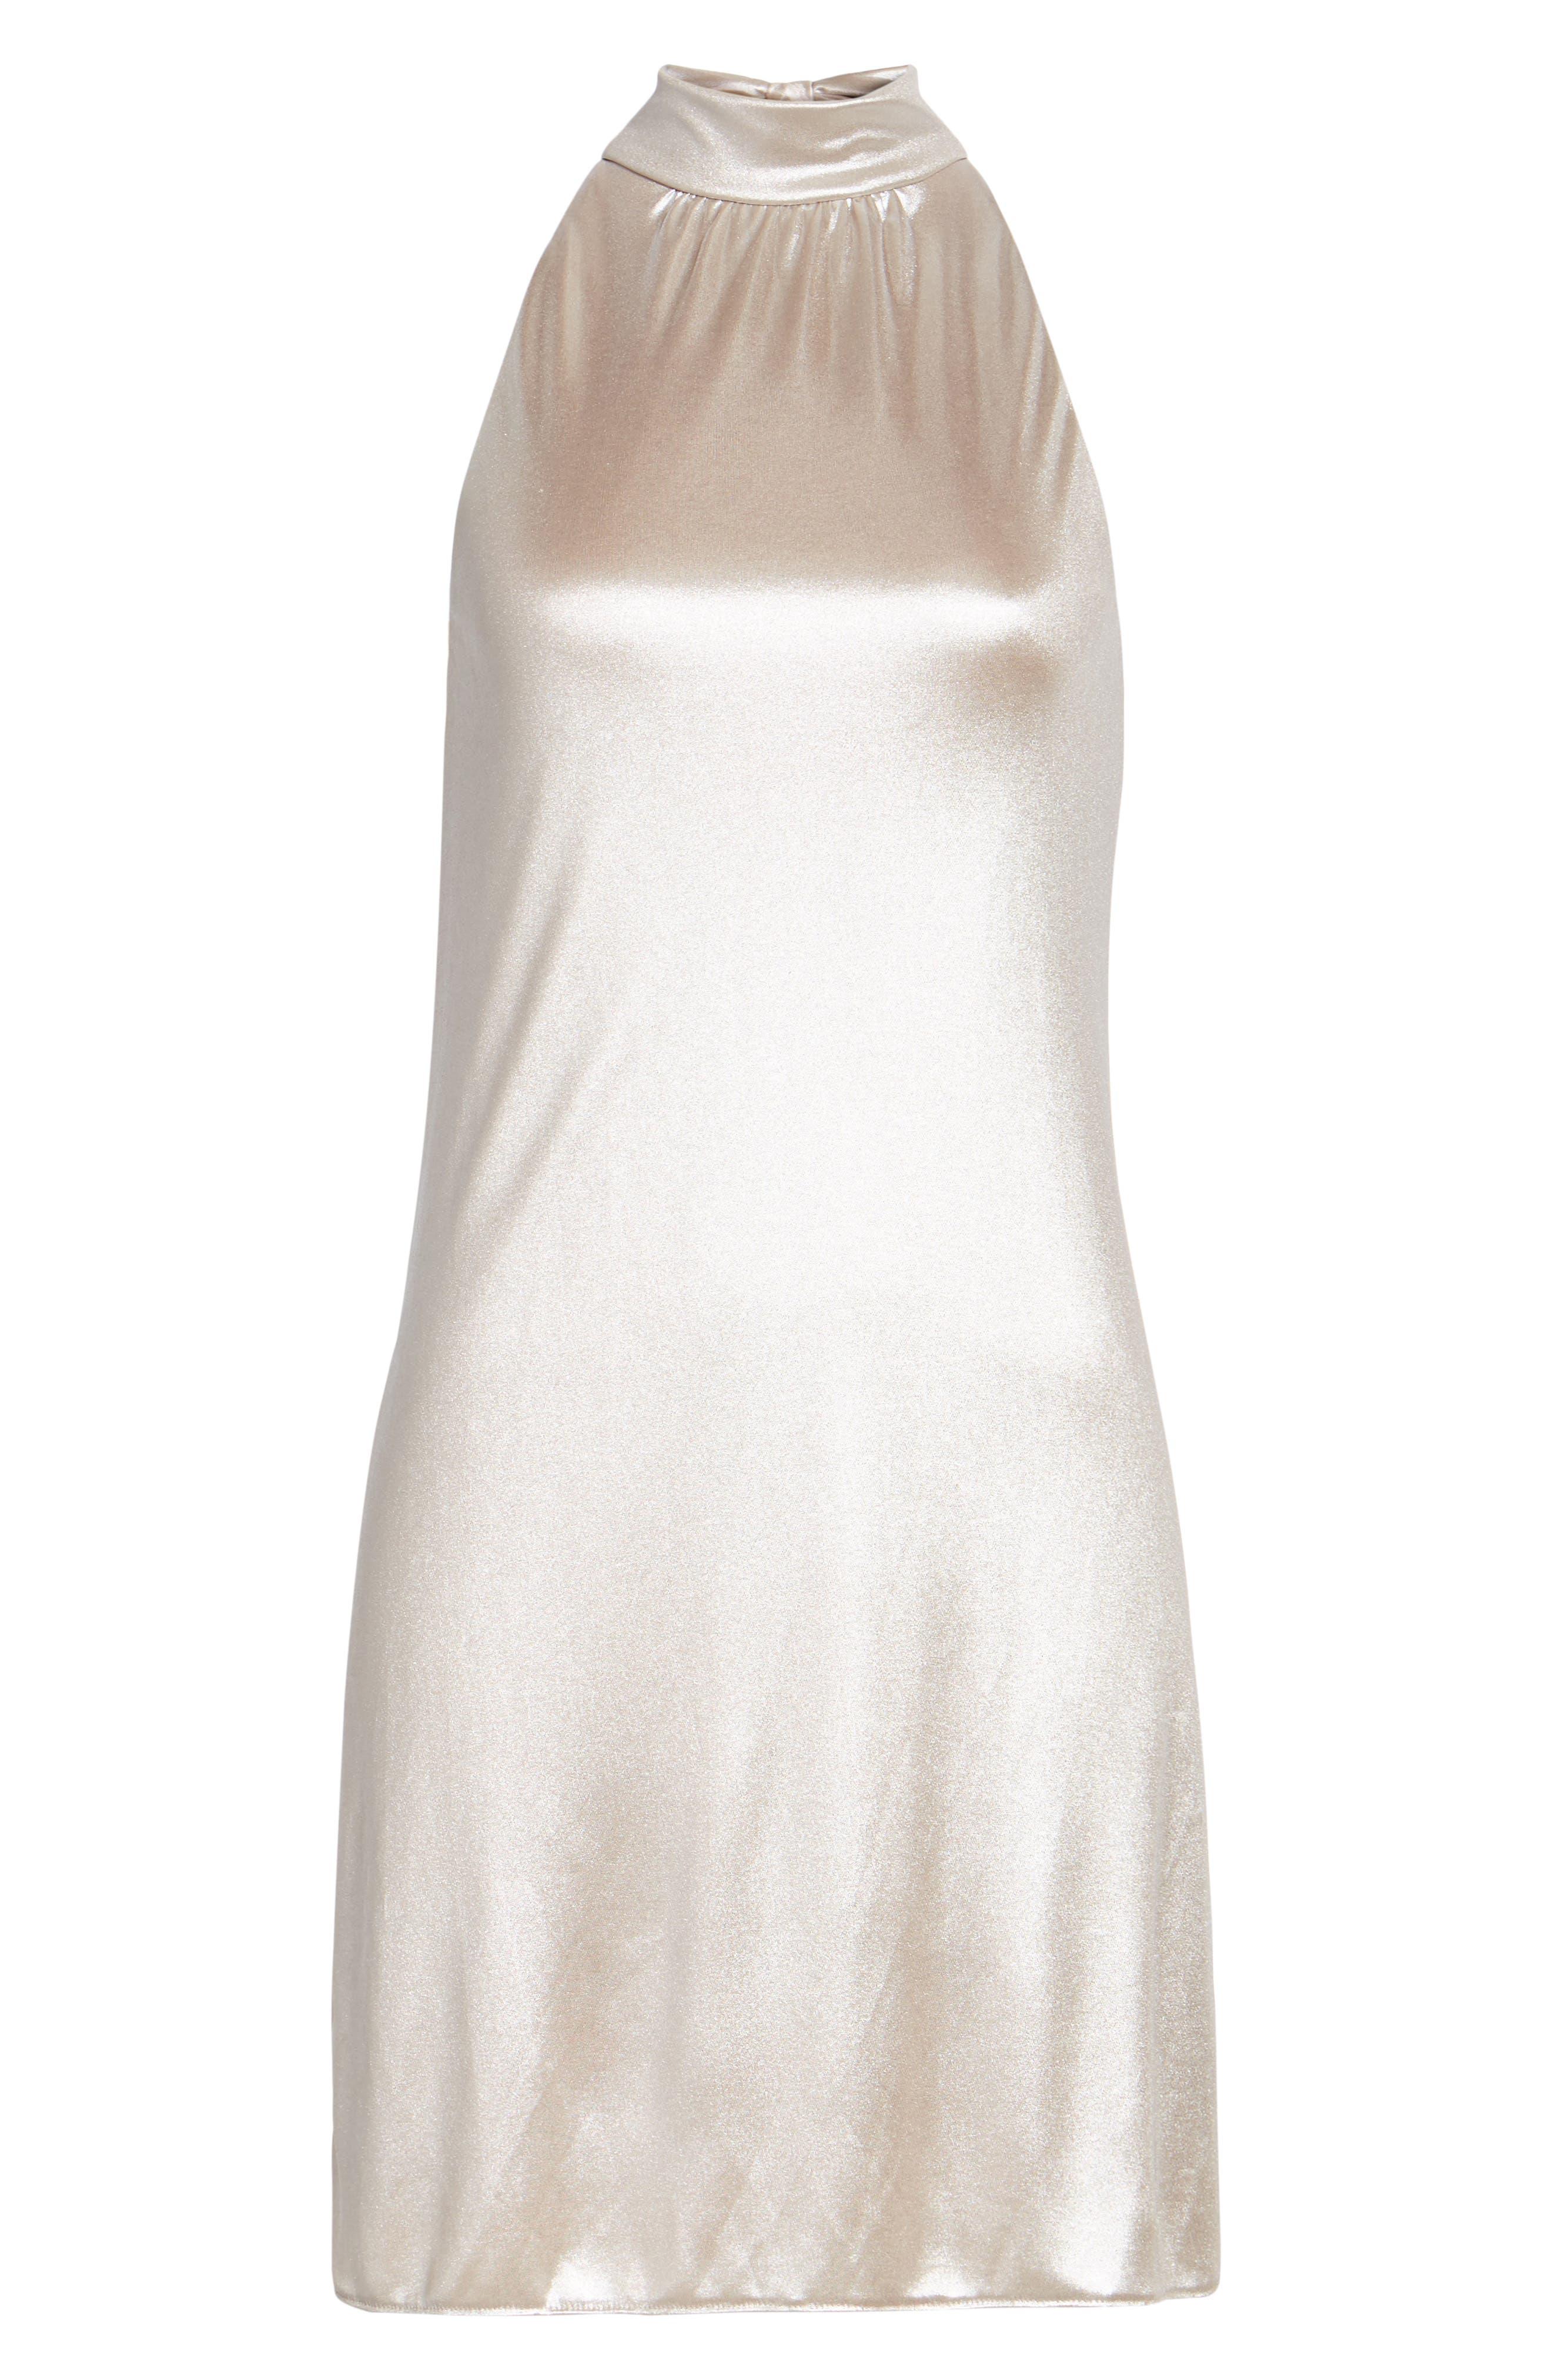 Director's Cut Dress,                             Alternate thumbnail 6, color,                             Rose Gold